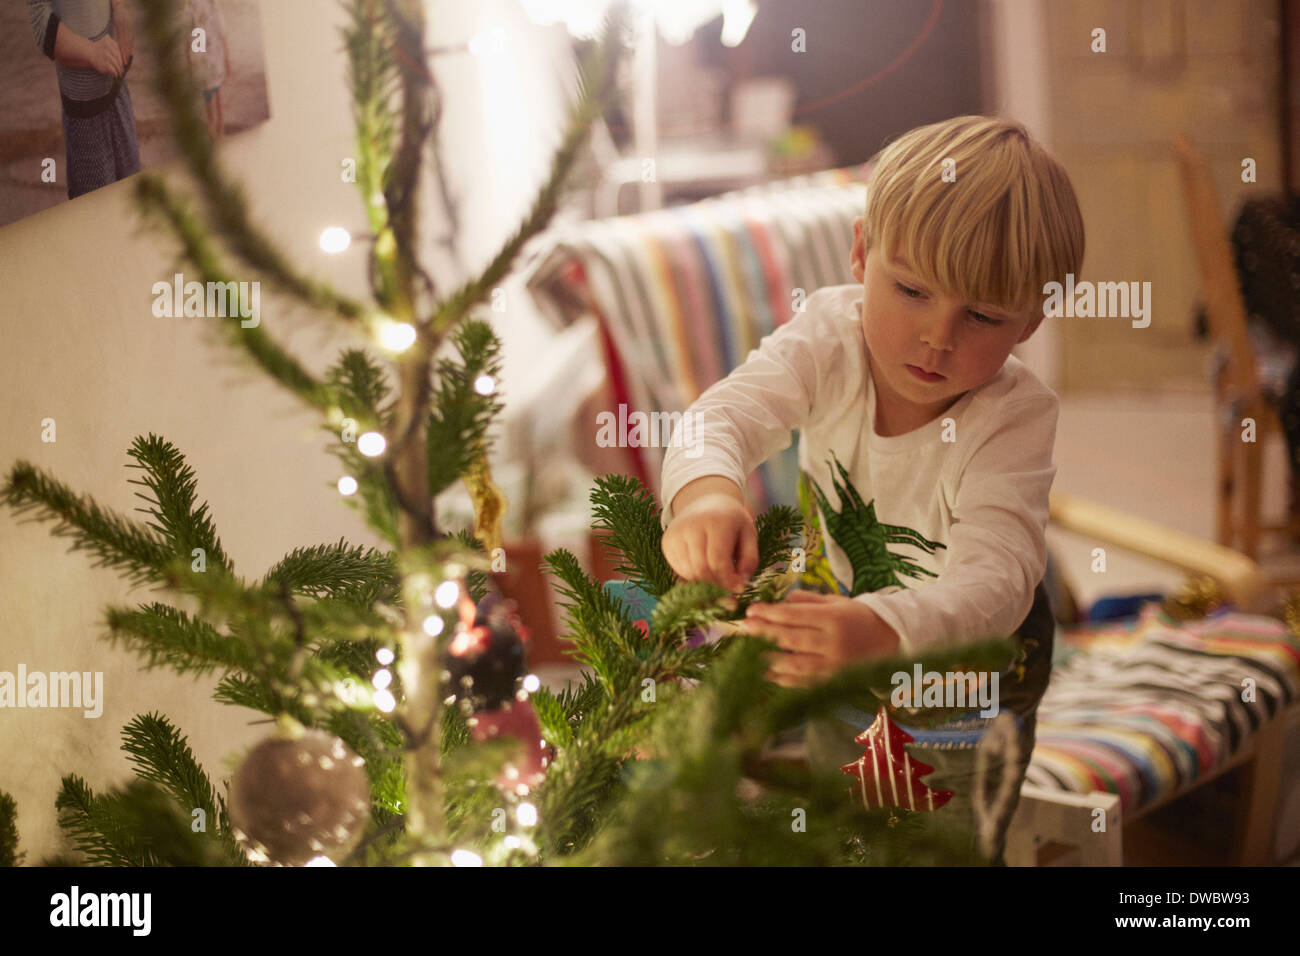 Young boy decorating tree at christmas - Stock Image